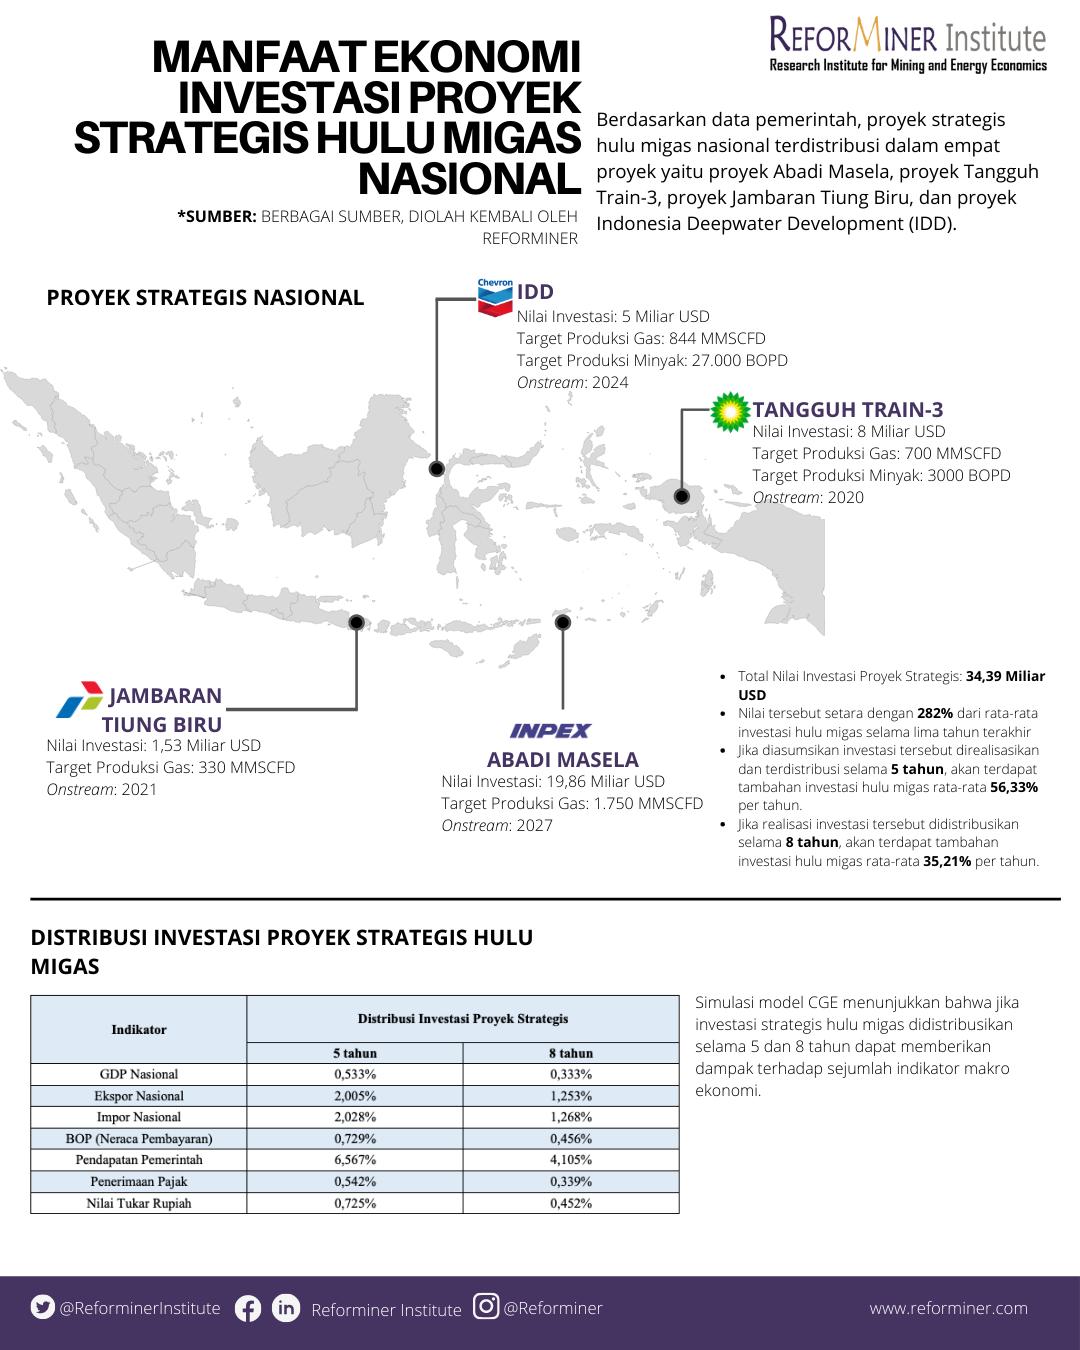 Manfaat Ekonomi Investasi Proyek Strategis Hulu Migas Nasional